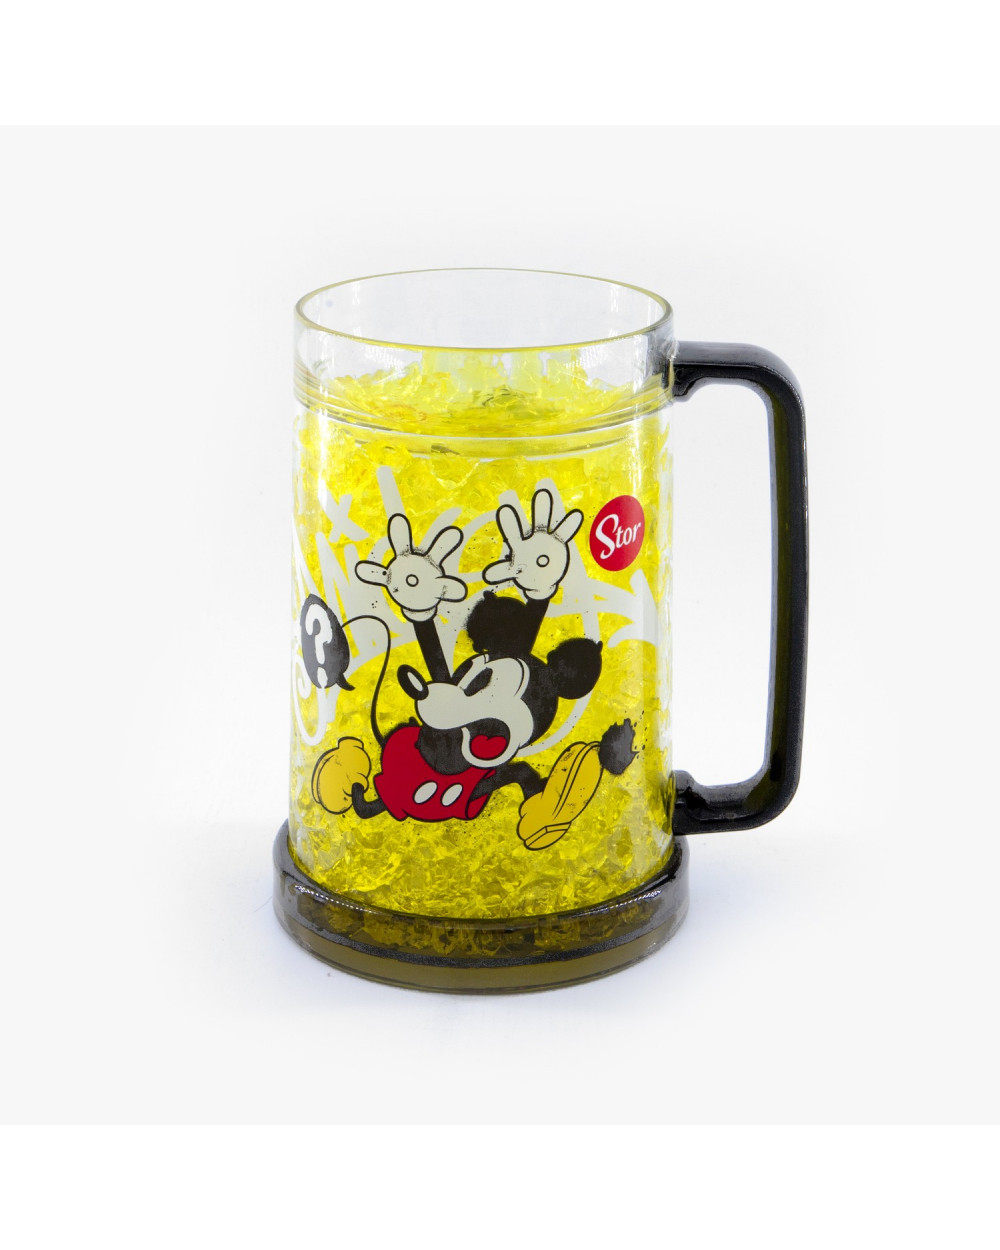 Jarro Jarro Mickey Jarro Freezer Freezer Mug Kiddo Mickey Kiddo Mug Kiddo EDYWIH2e9